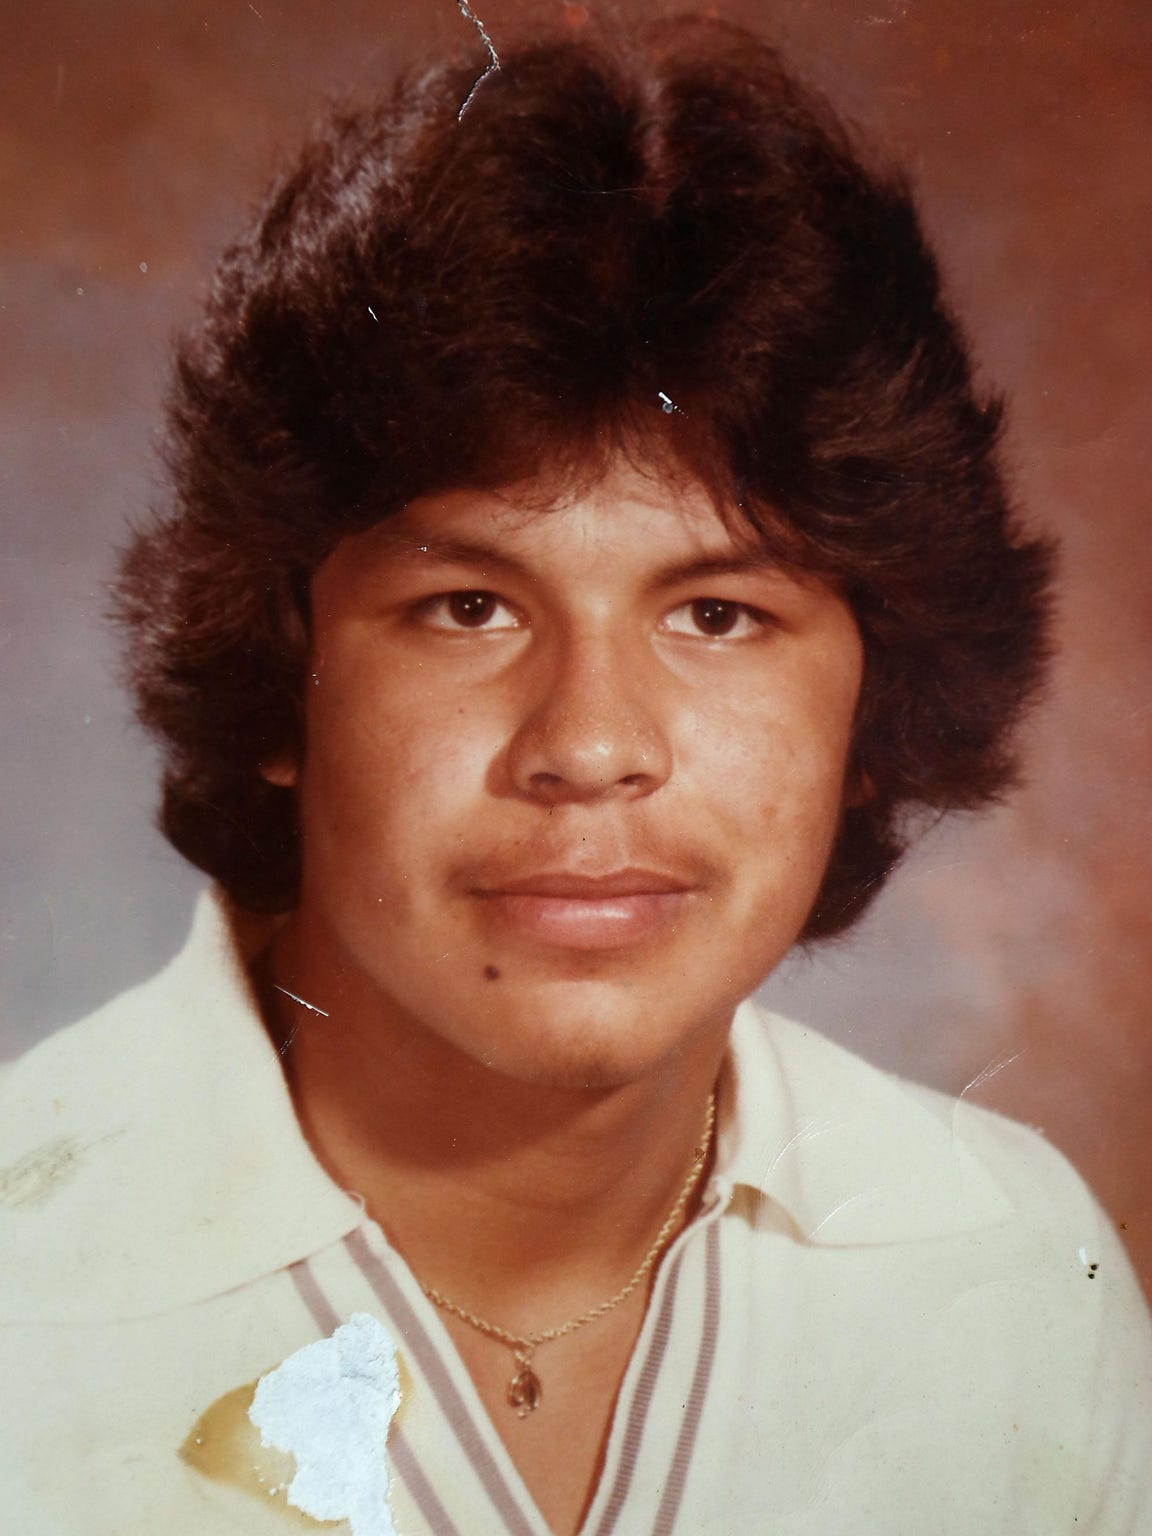 Danny 'Beto' Salazar